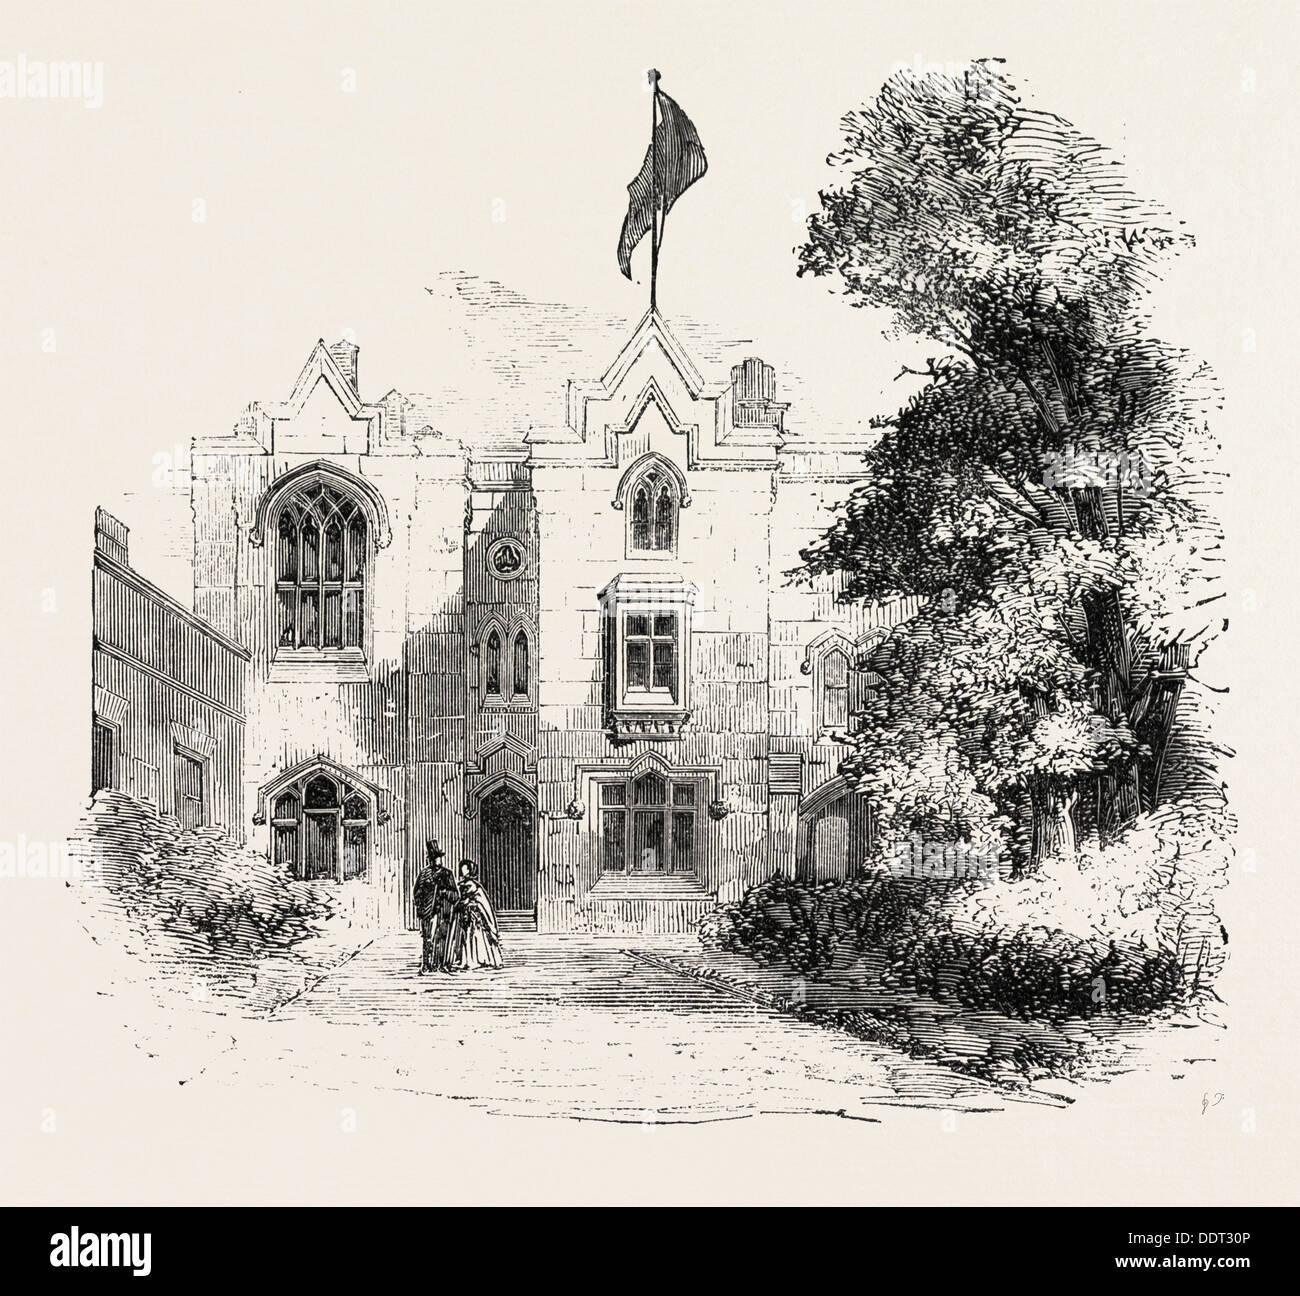 SCHOOL FOR DEAF AND DUMB INFANTS AT OLD TRAFFORD, MANCHESTER, UK, 1860 engraving - Stock Image